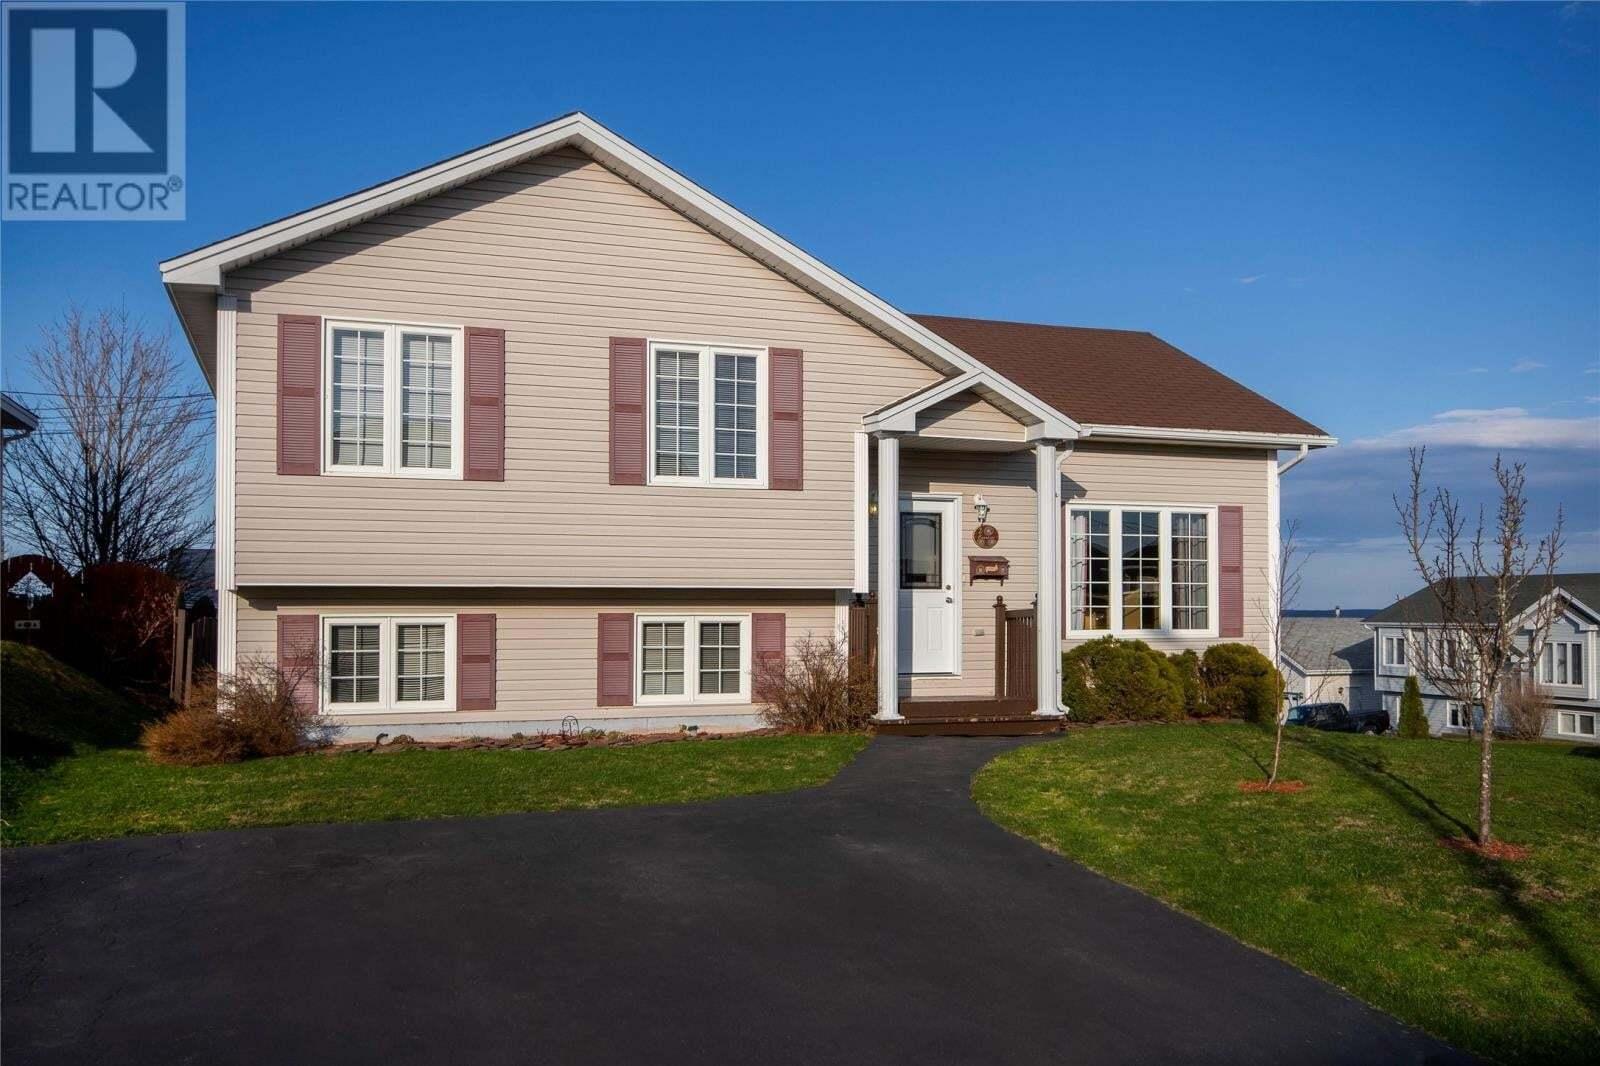 House for sale at 2 Mastiff Pl Paradise Newfoundland - MLS: 1213959